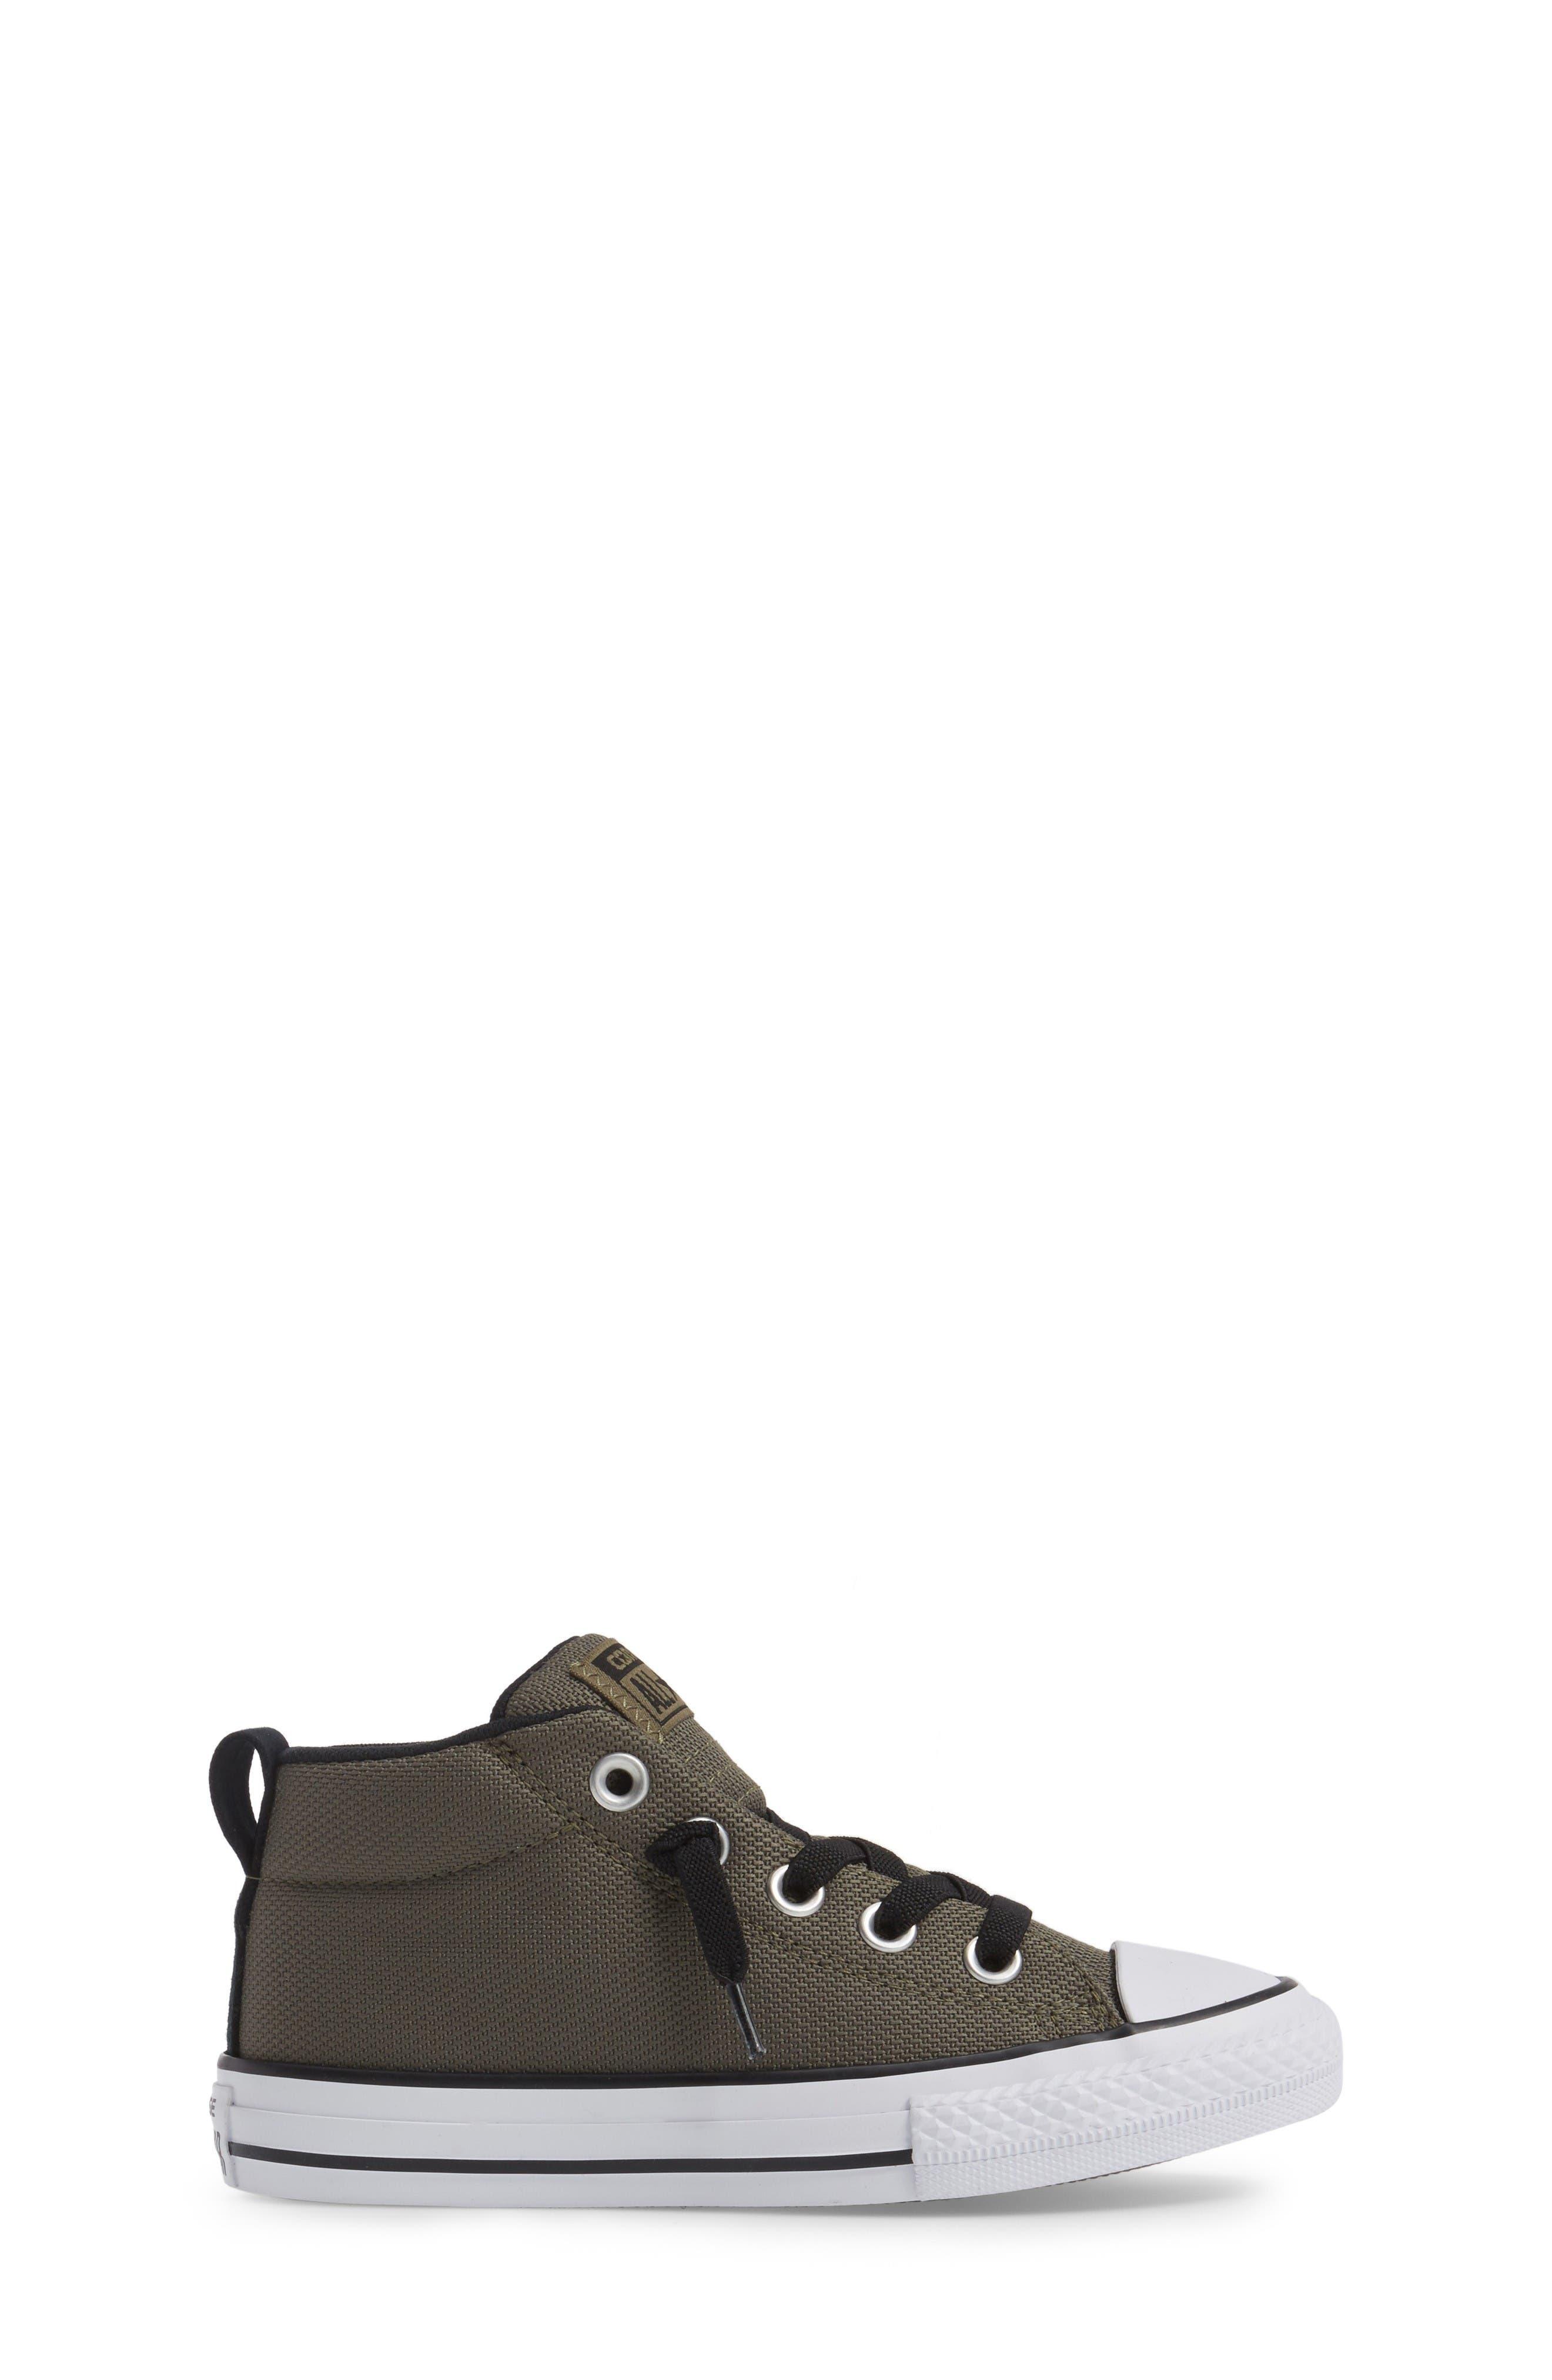 Alternate Image 3  - Converse Chuck Taylor® All Star® Basket Weave Street Mid Sneaker (Toddler, Little Kid & Big Kid)